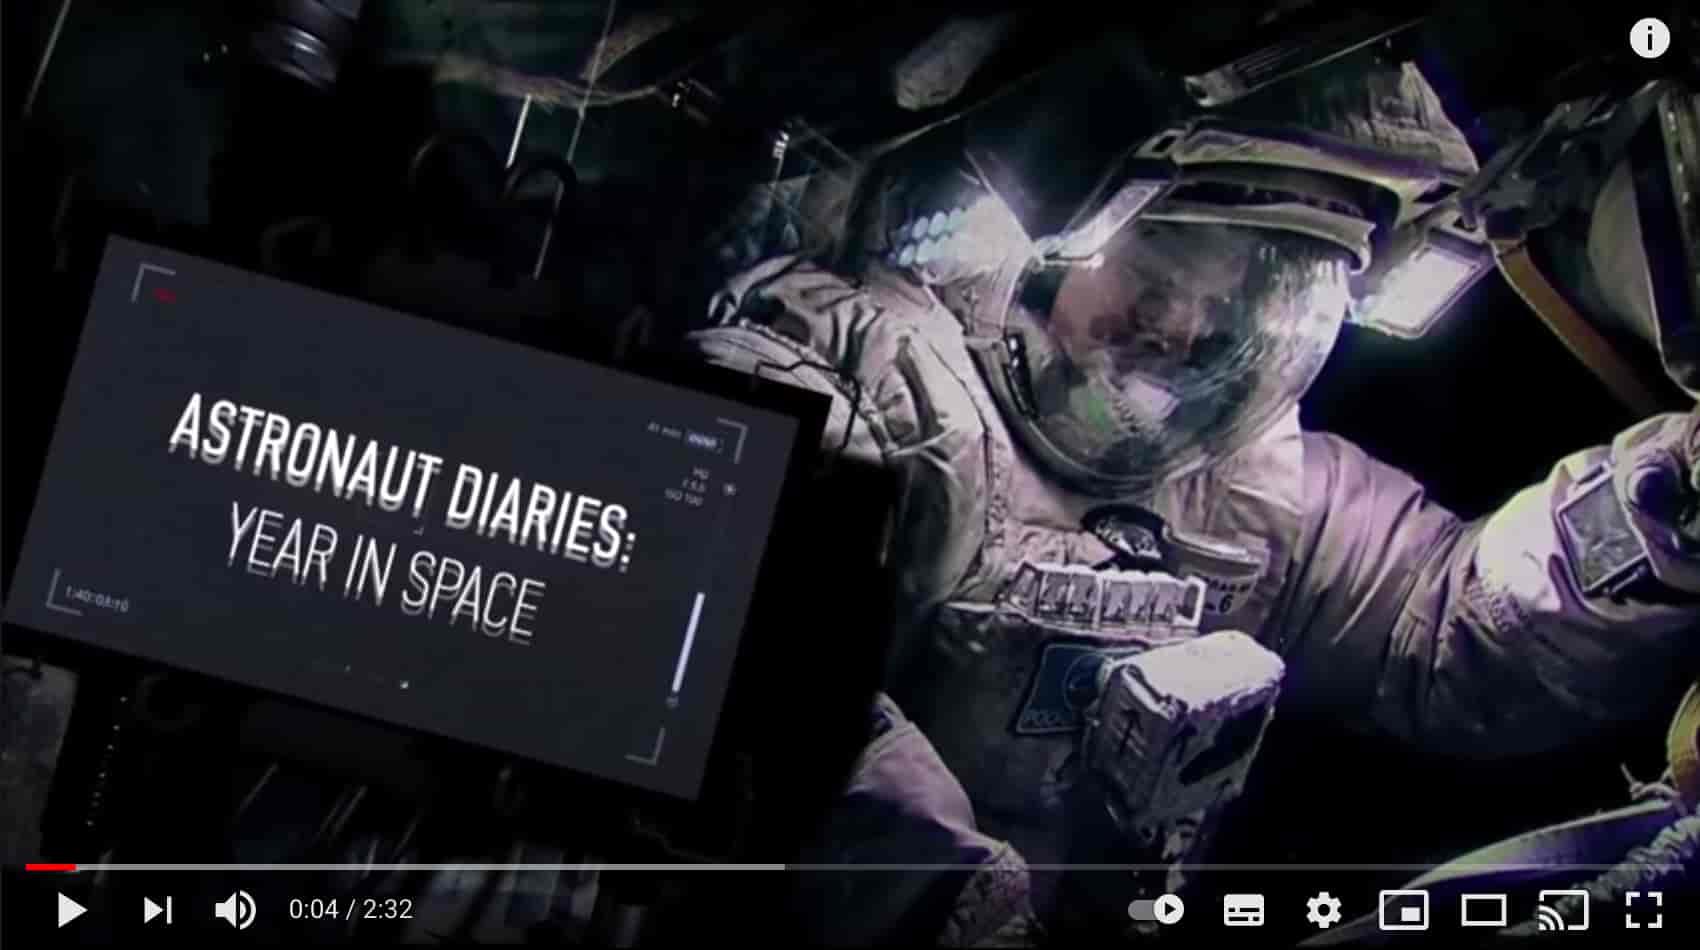 astronaut diaries